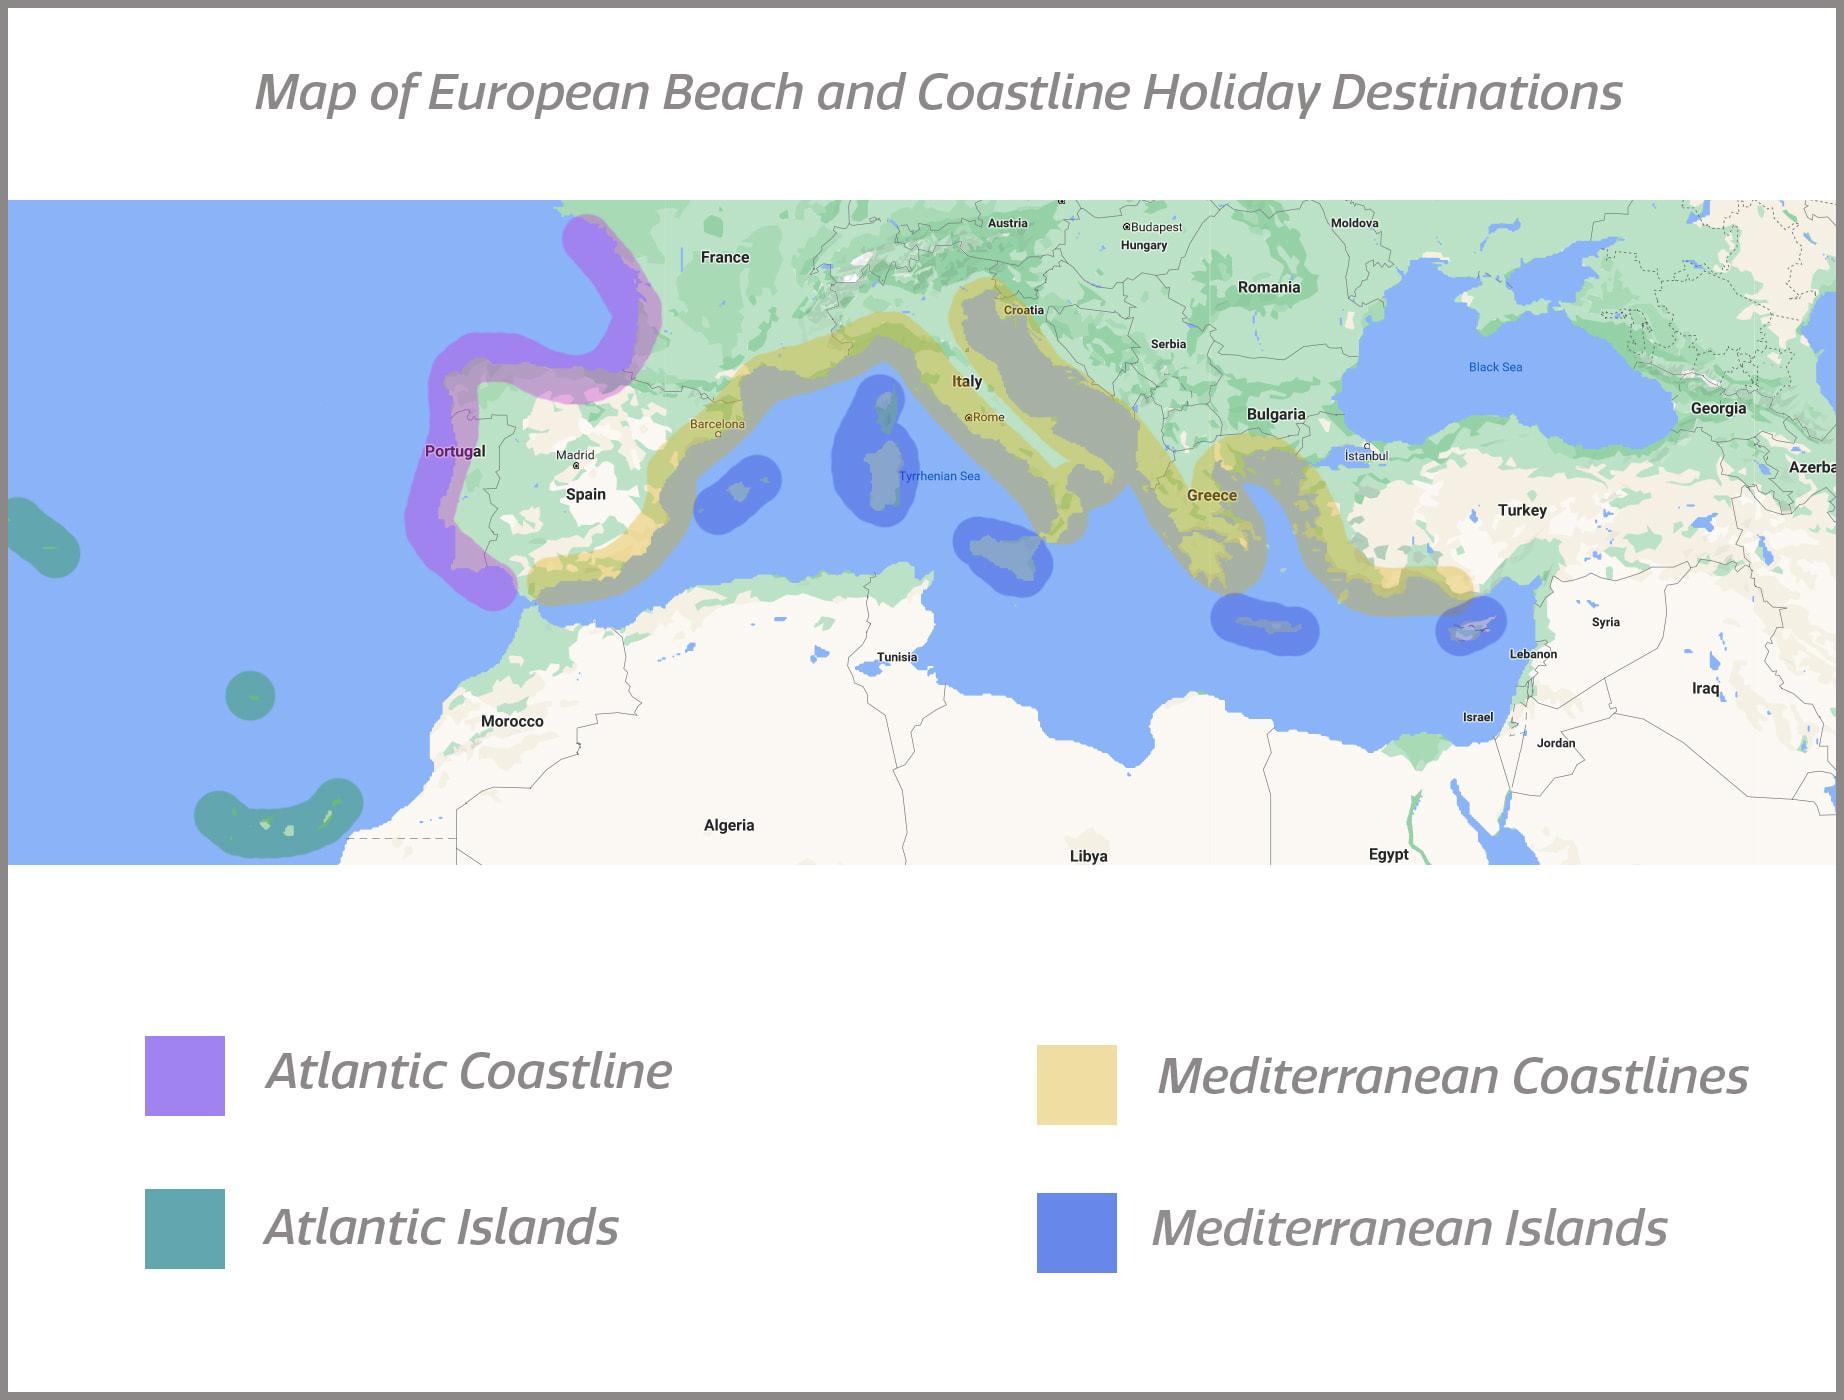 The Glittering Atlantic Islands SequinQueen Map